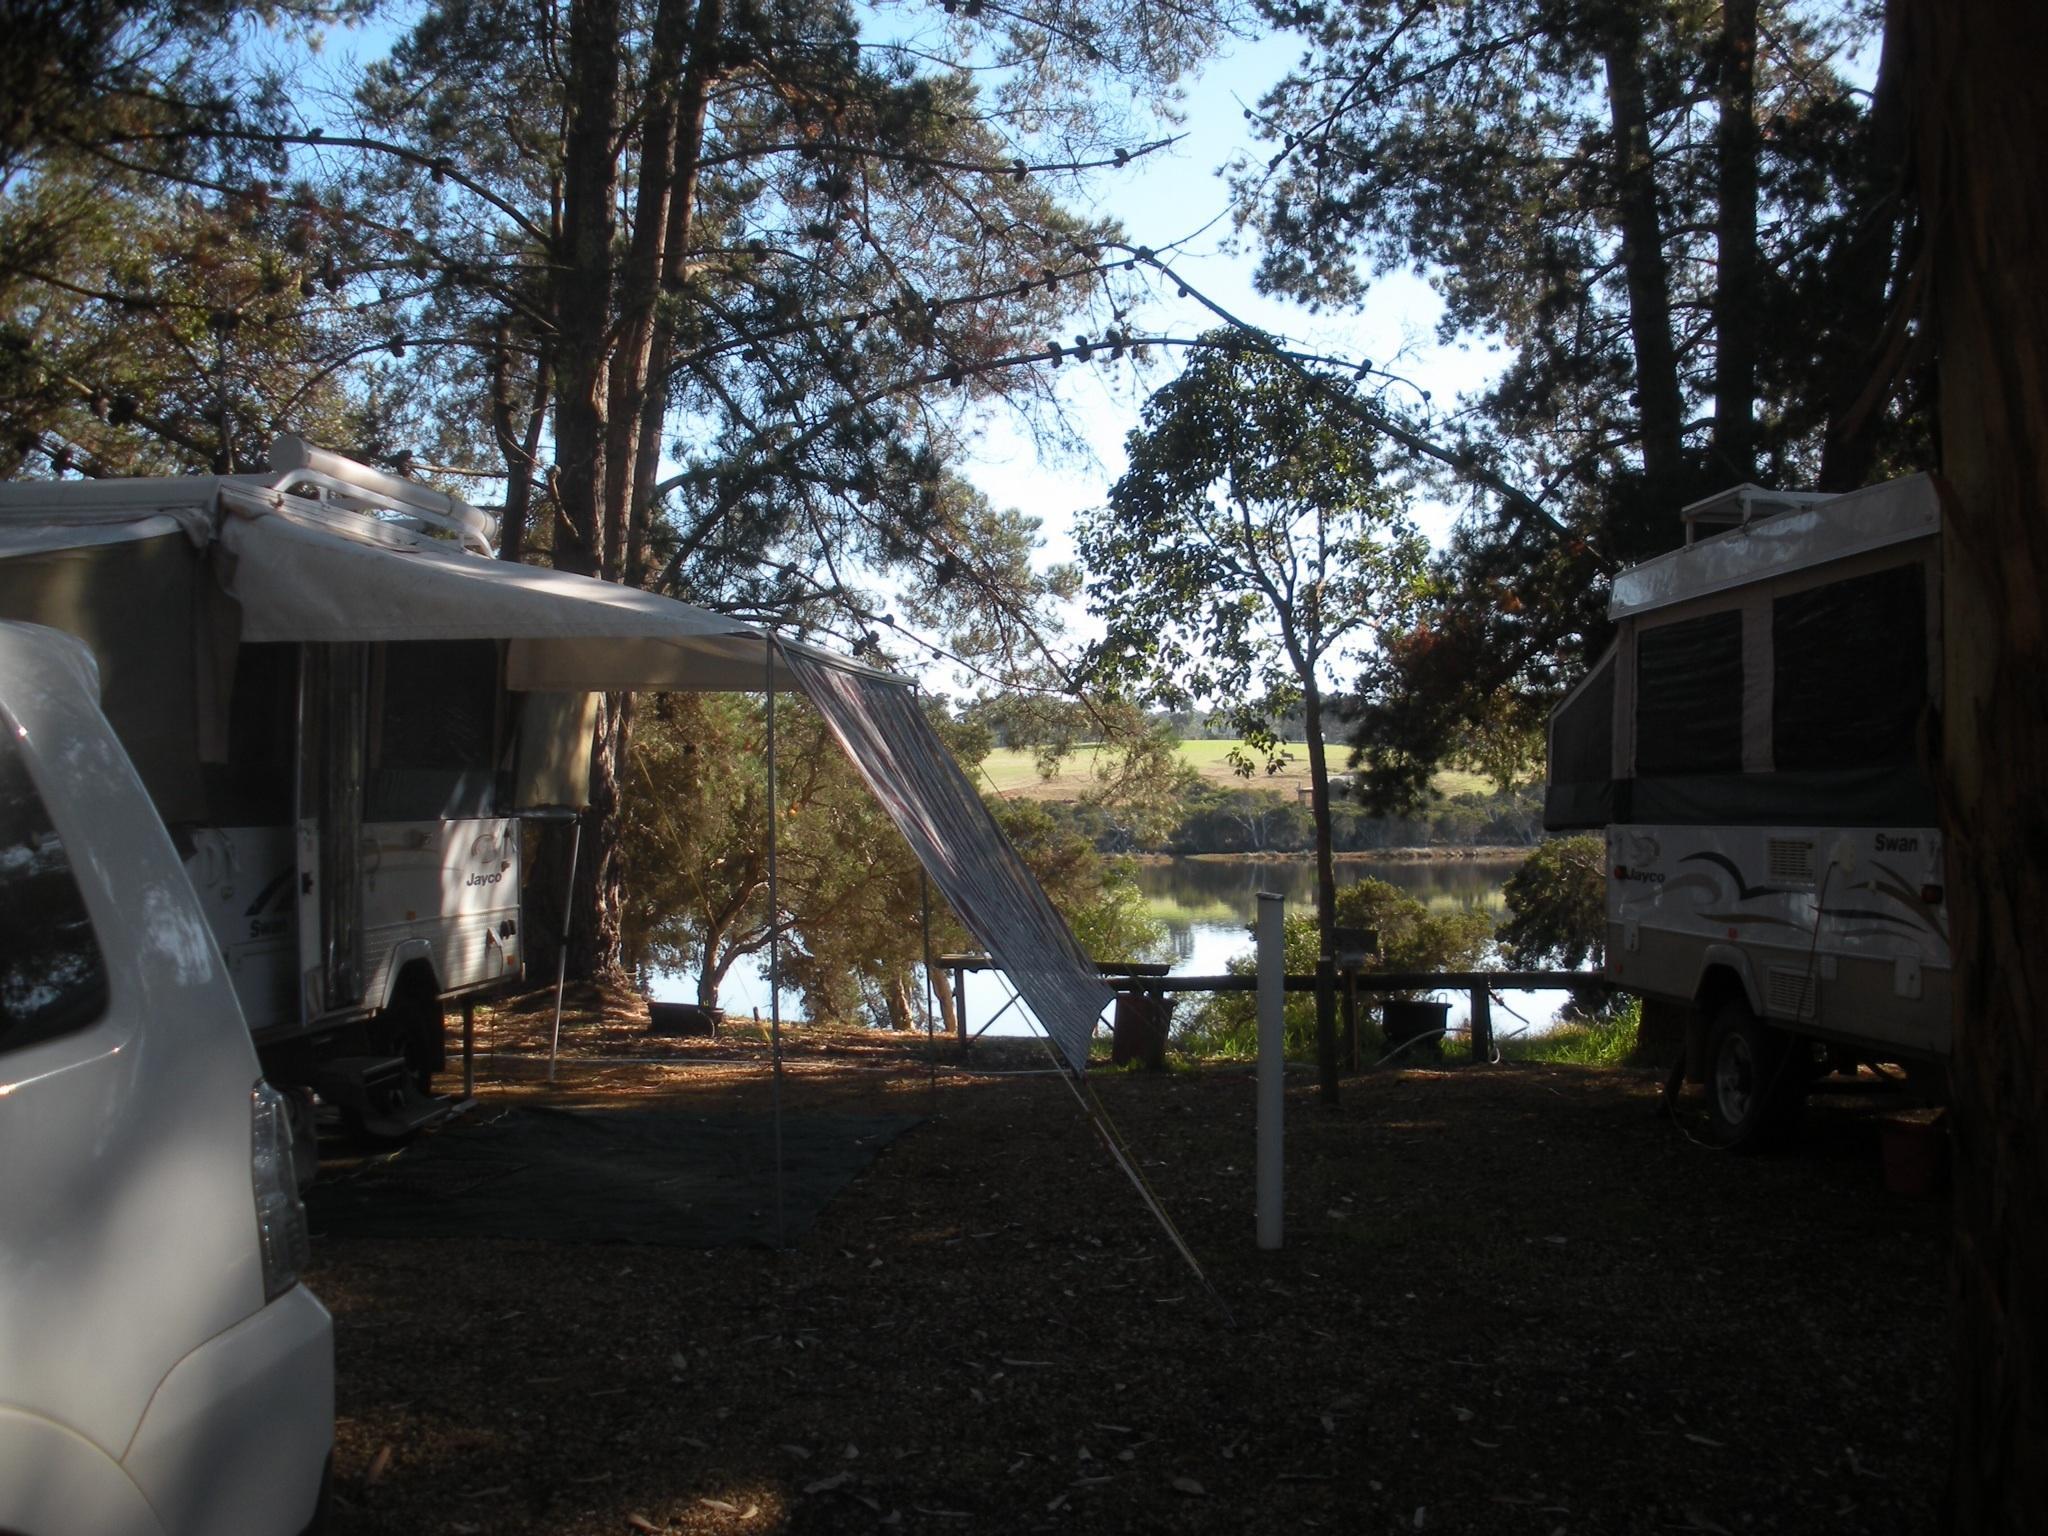 Kalgan River Chalets and Caravan Park